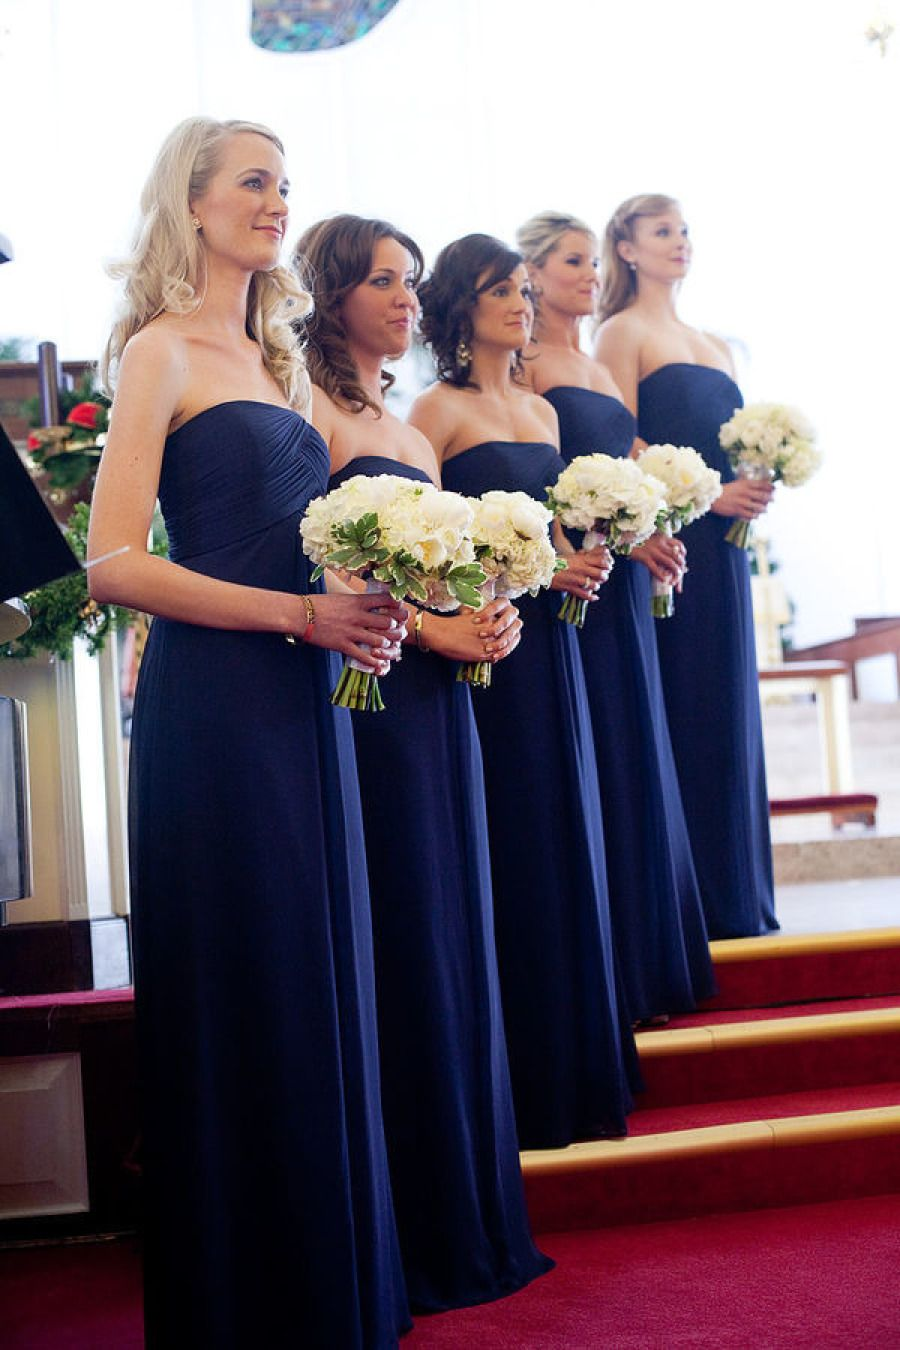 Long Bridesmaids Dresses Via Inweddingdress Bridesmaid I Want Them To Wear This Dress: Marine Dress Blues Wedding At Reisefeber.org